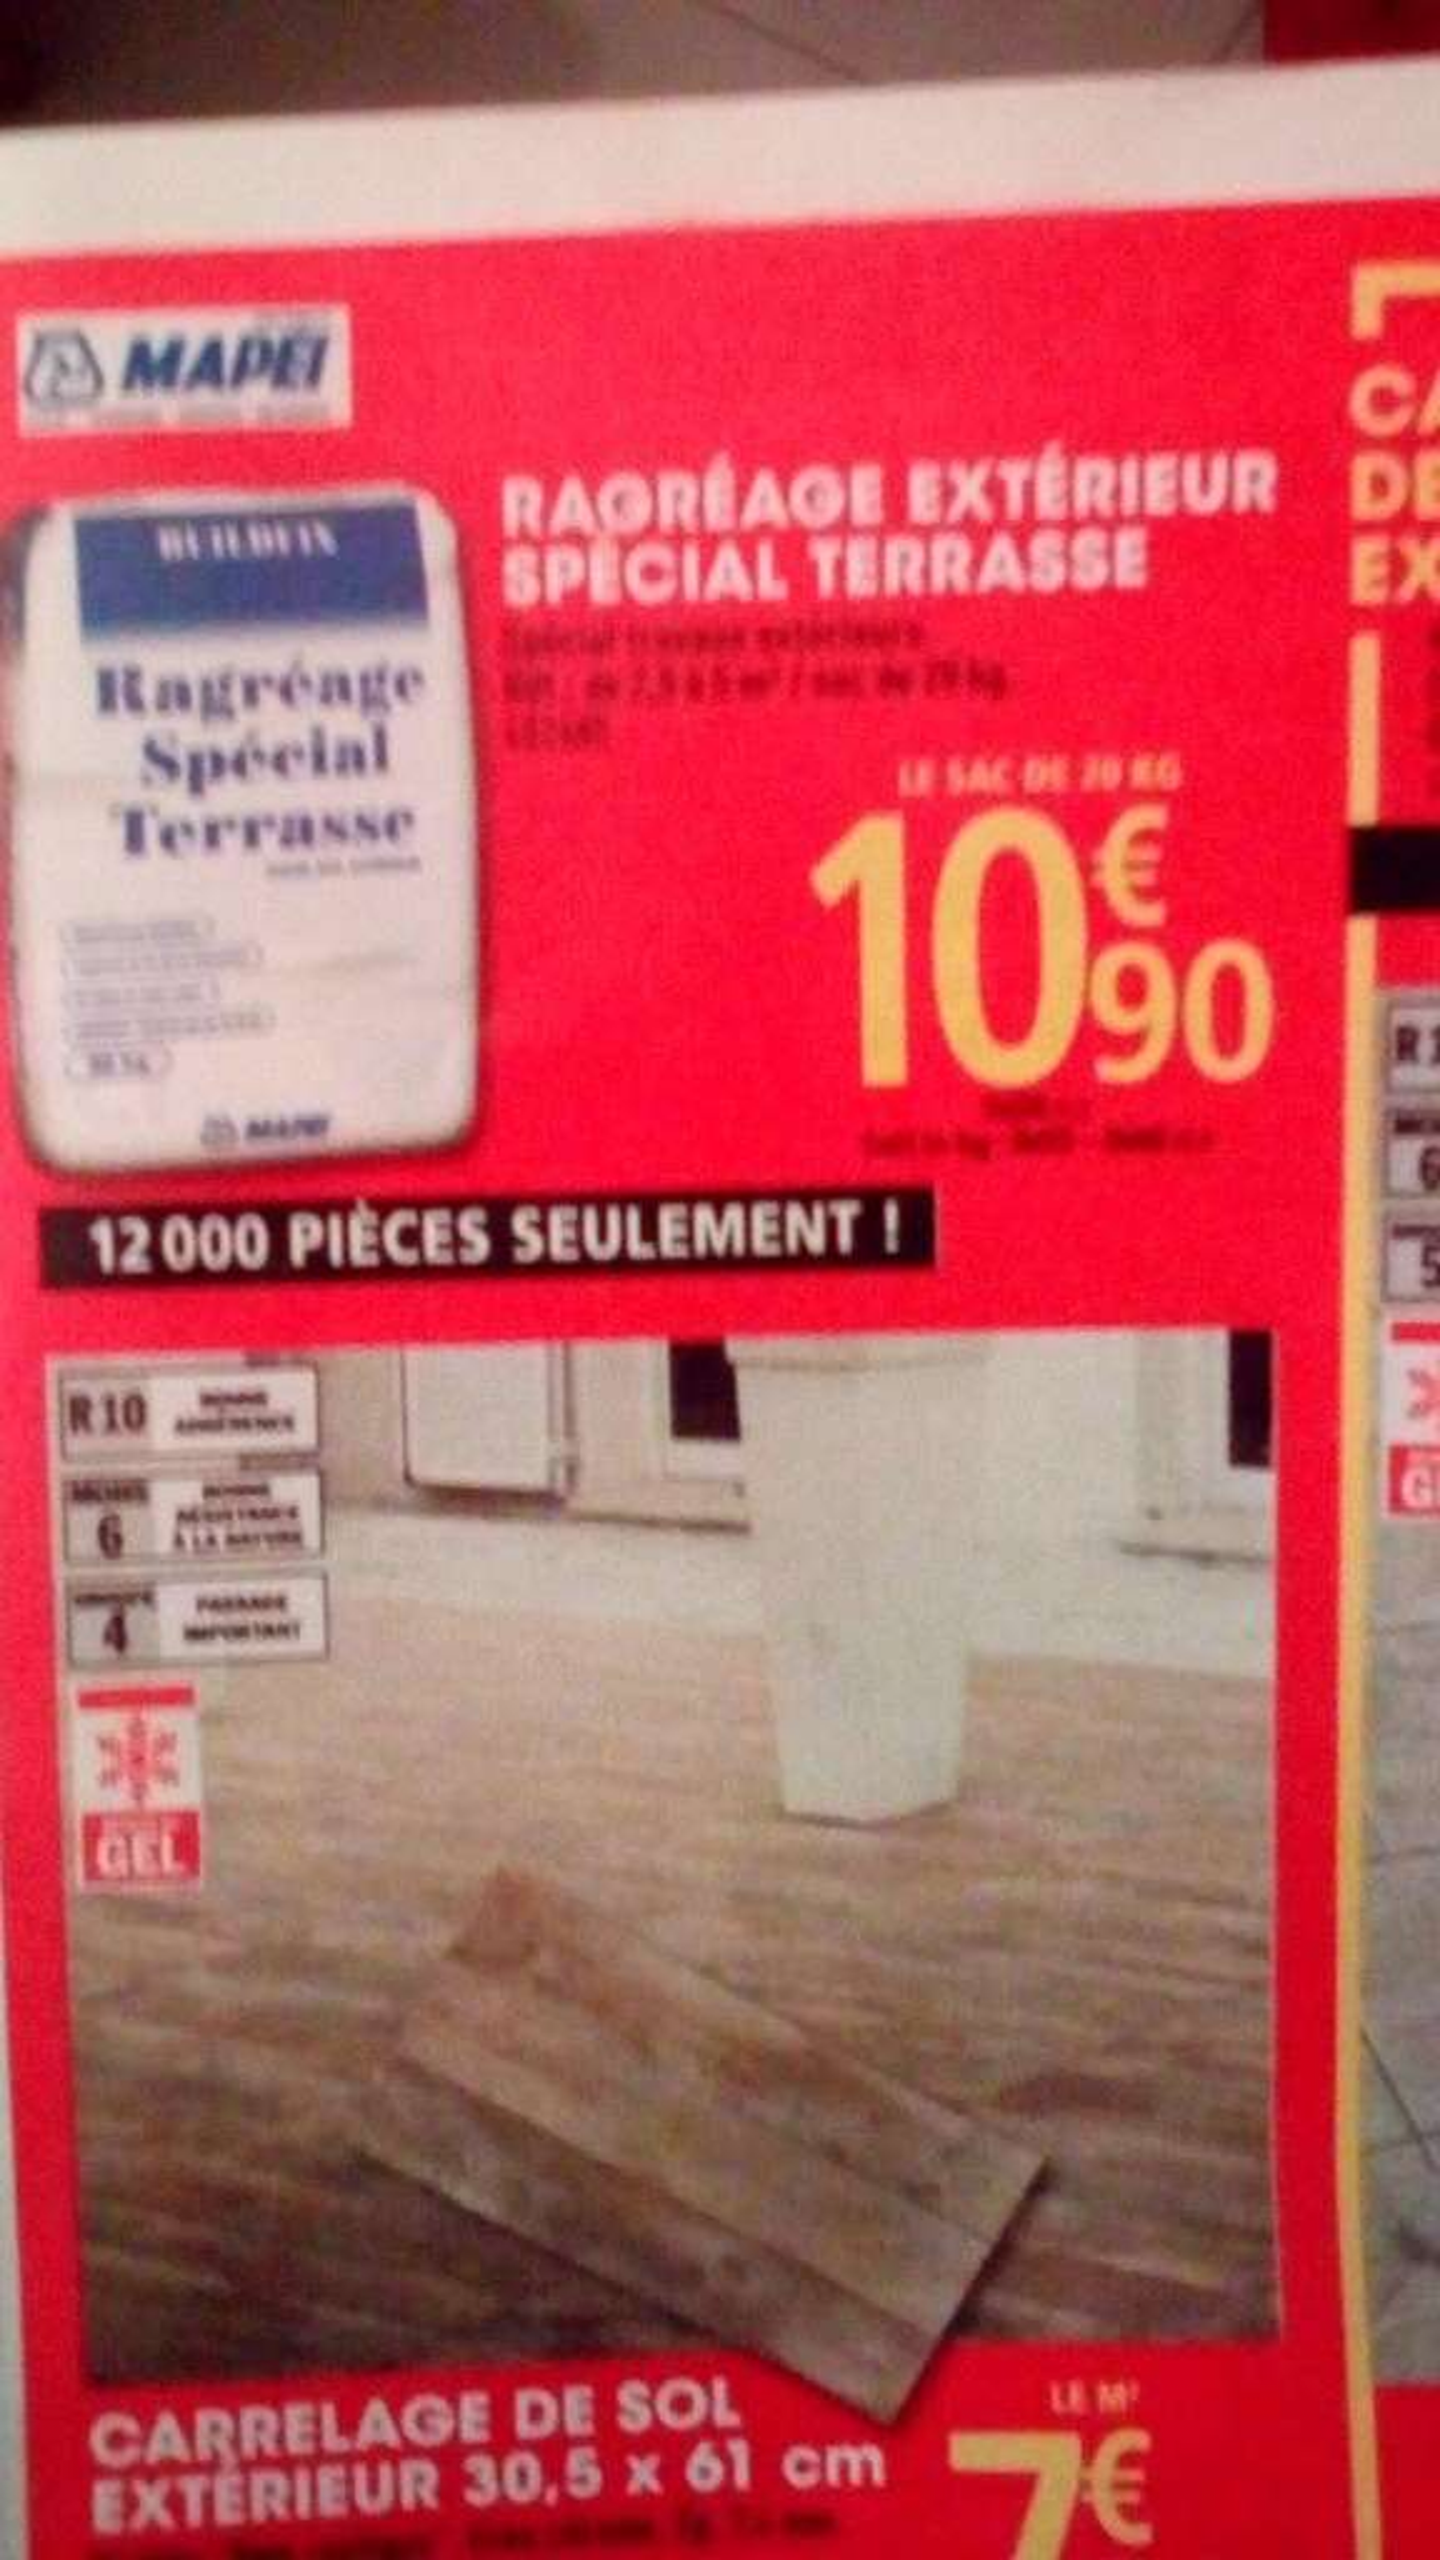 ragr age ext rieur sp cial terrasse. Black Bedroom Furniture Sets. Home Design Ideas